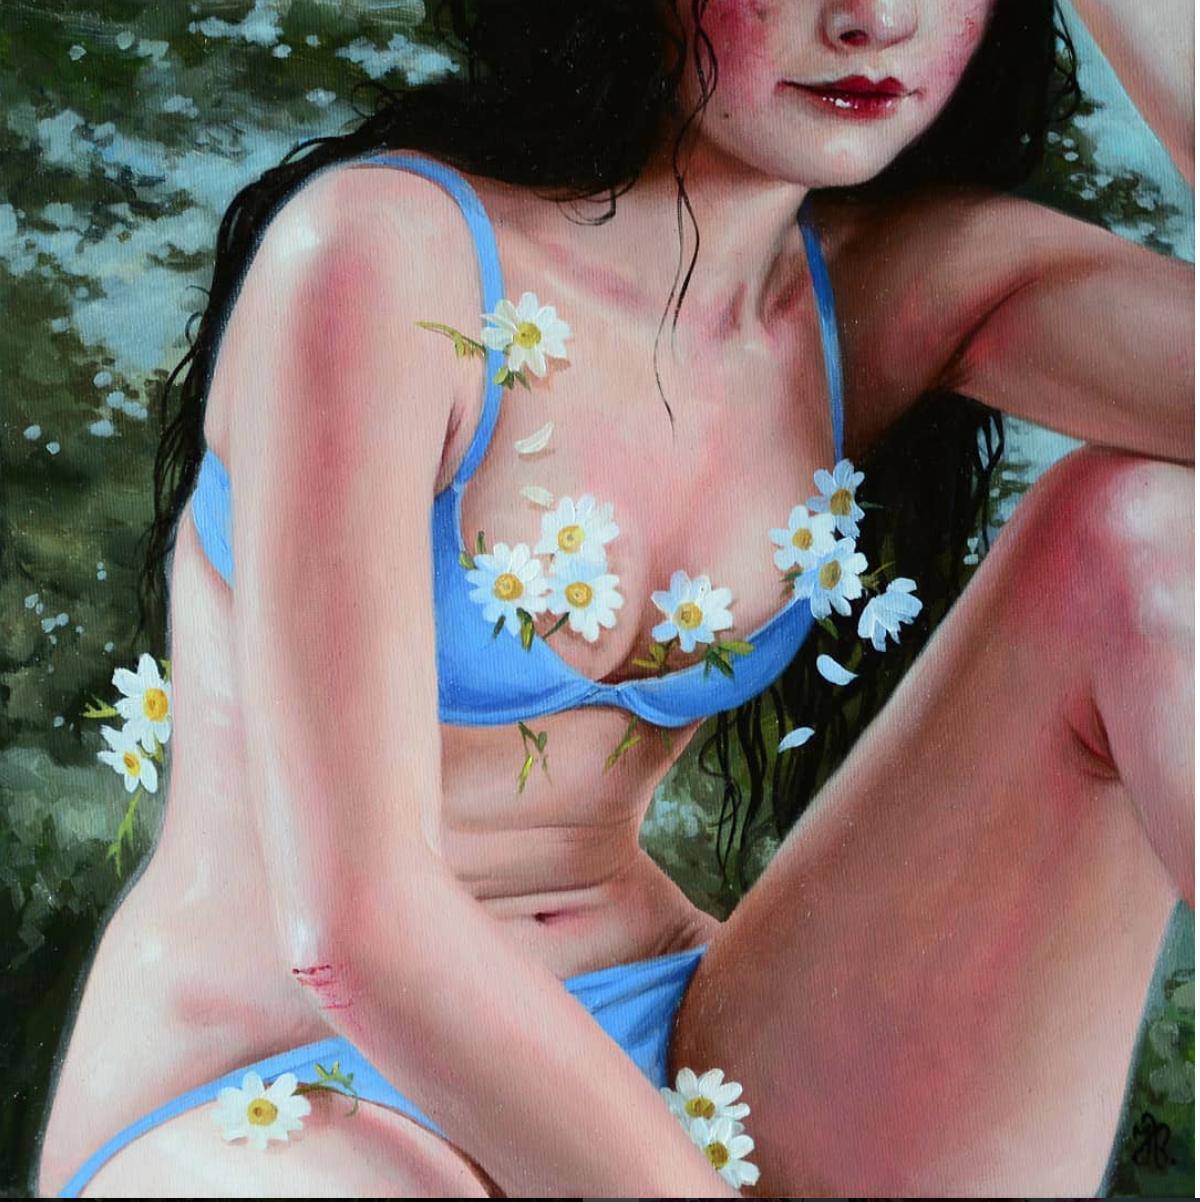 """The Wild Honey Girl""by Jana Brike - Gallery House Toronto"